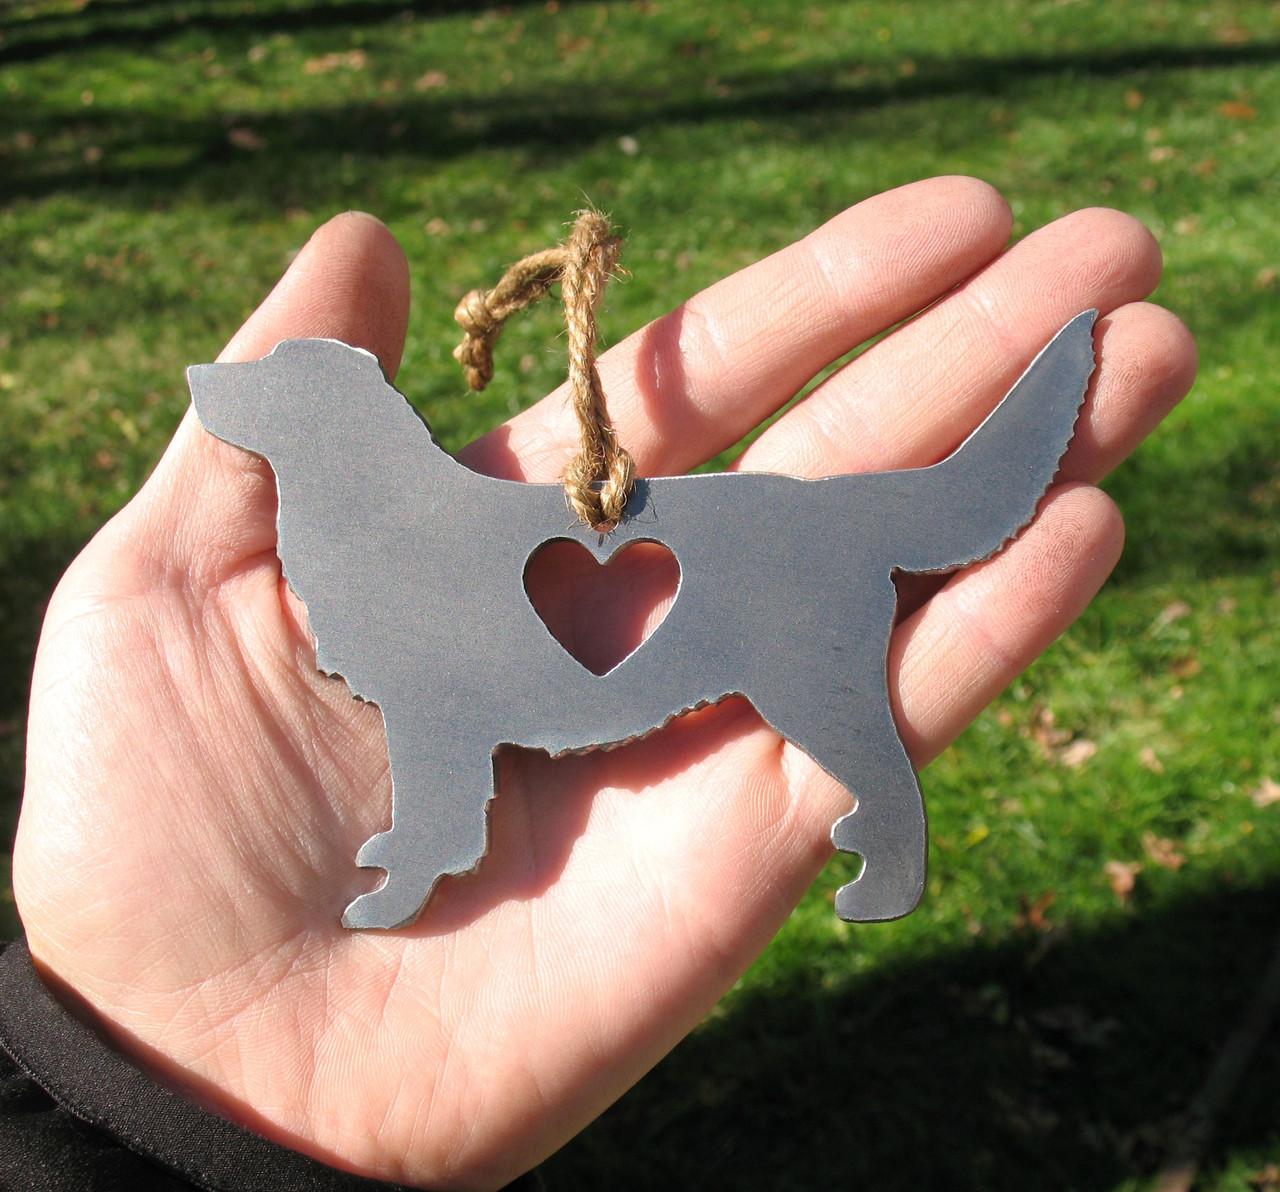 Golden Retriever 4 Pet Loss Gift Ornament - Pet Memorial - Dog Sympathy Remembrance Gift - Metal Dog Christmas Ornament